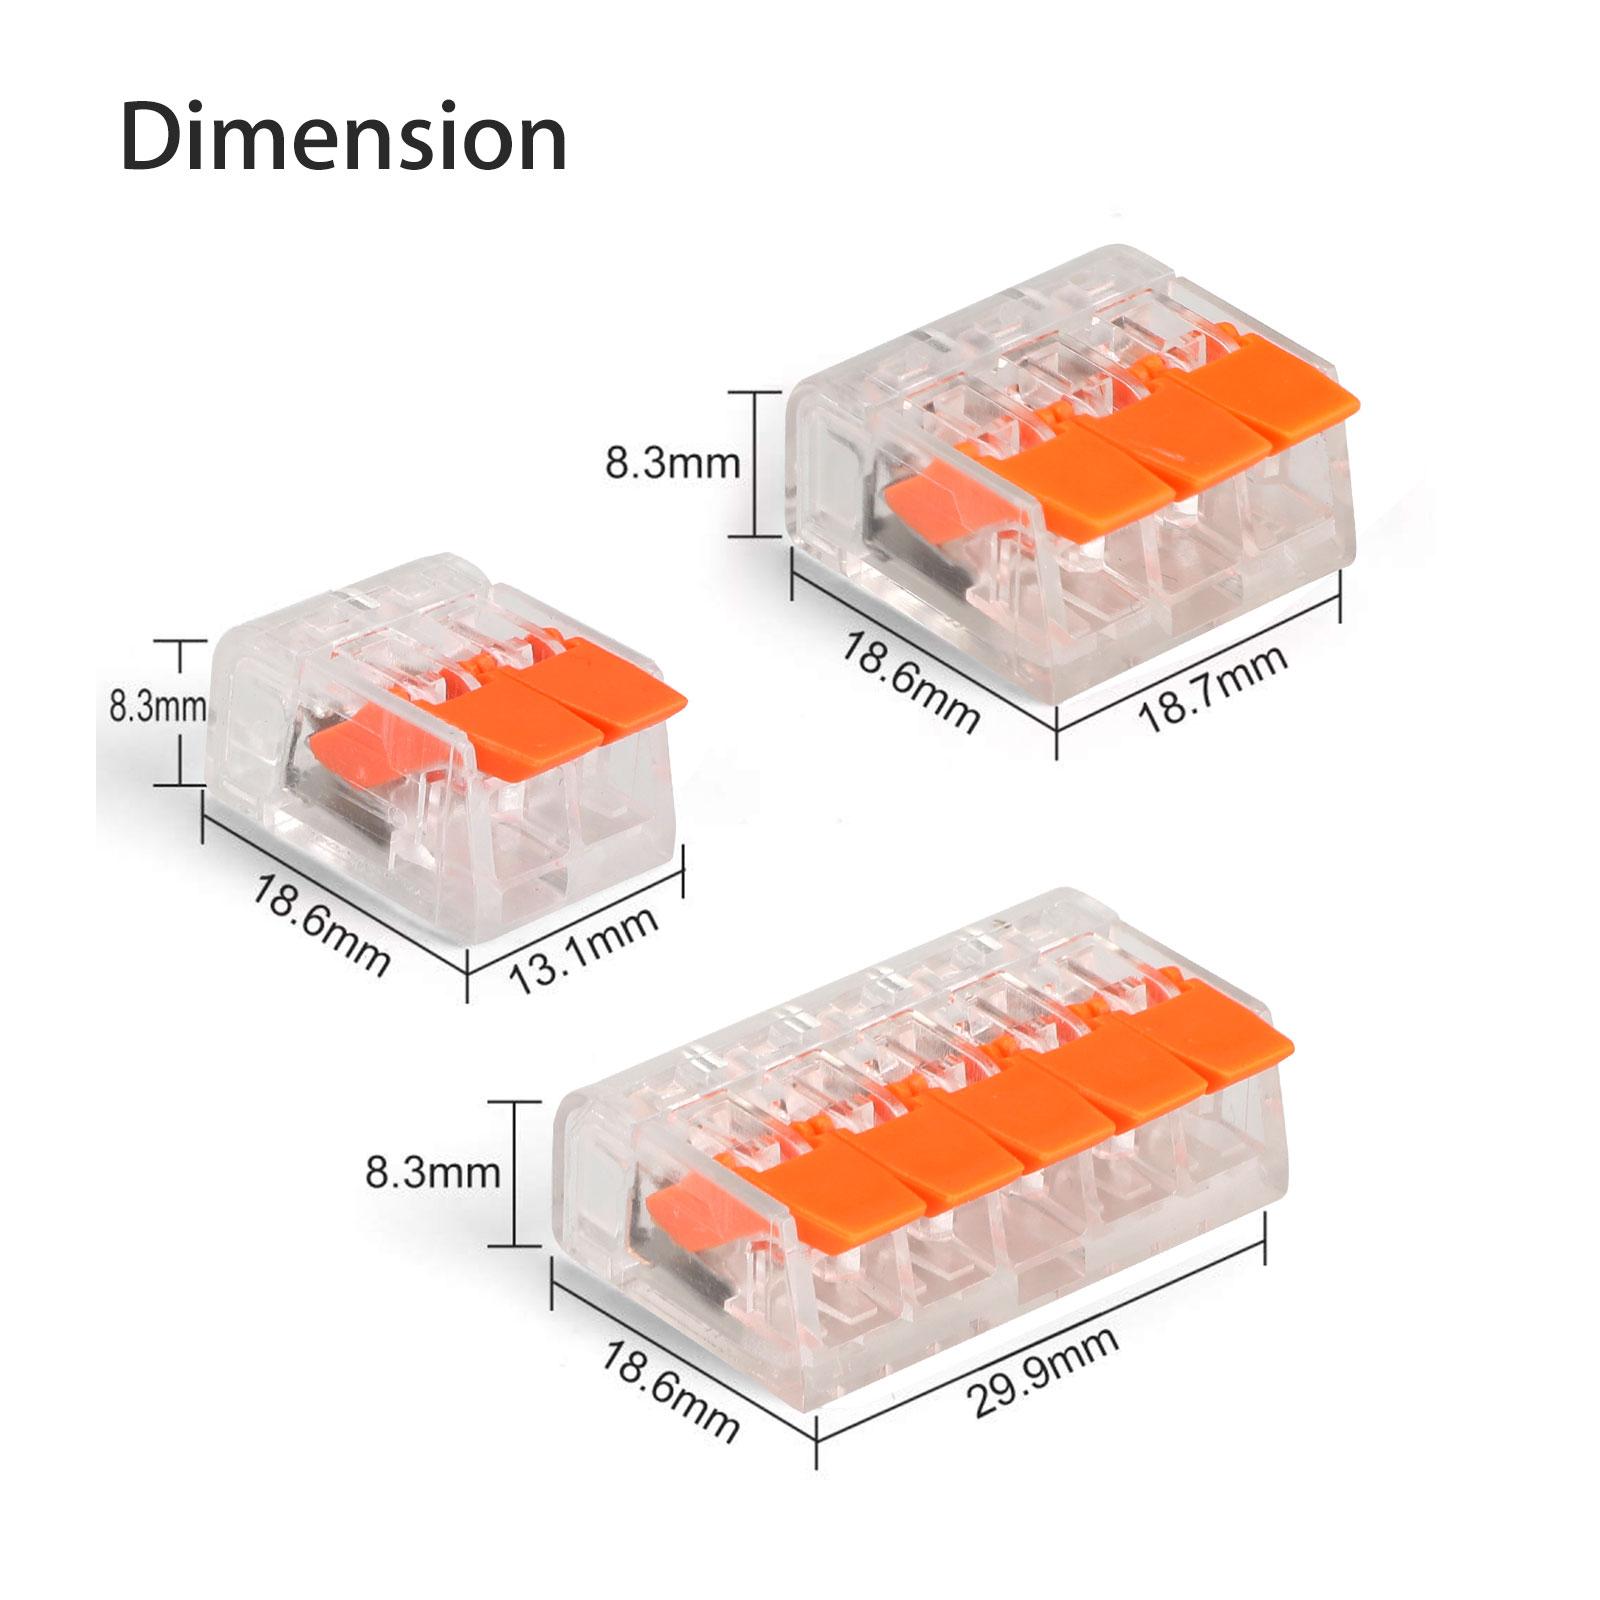 thumbnail 7 - 75Pcs 221-412 Lever Nut Compact Splicing Wire Connectors - 2/3/5 Conductor Set